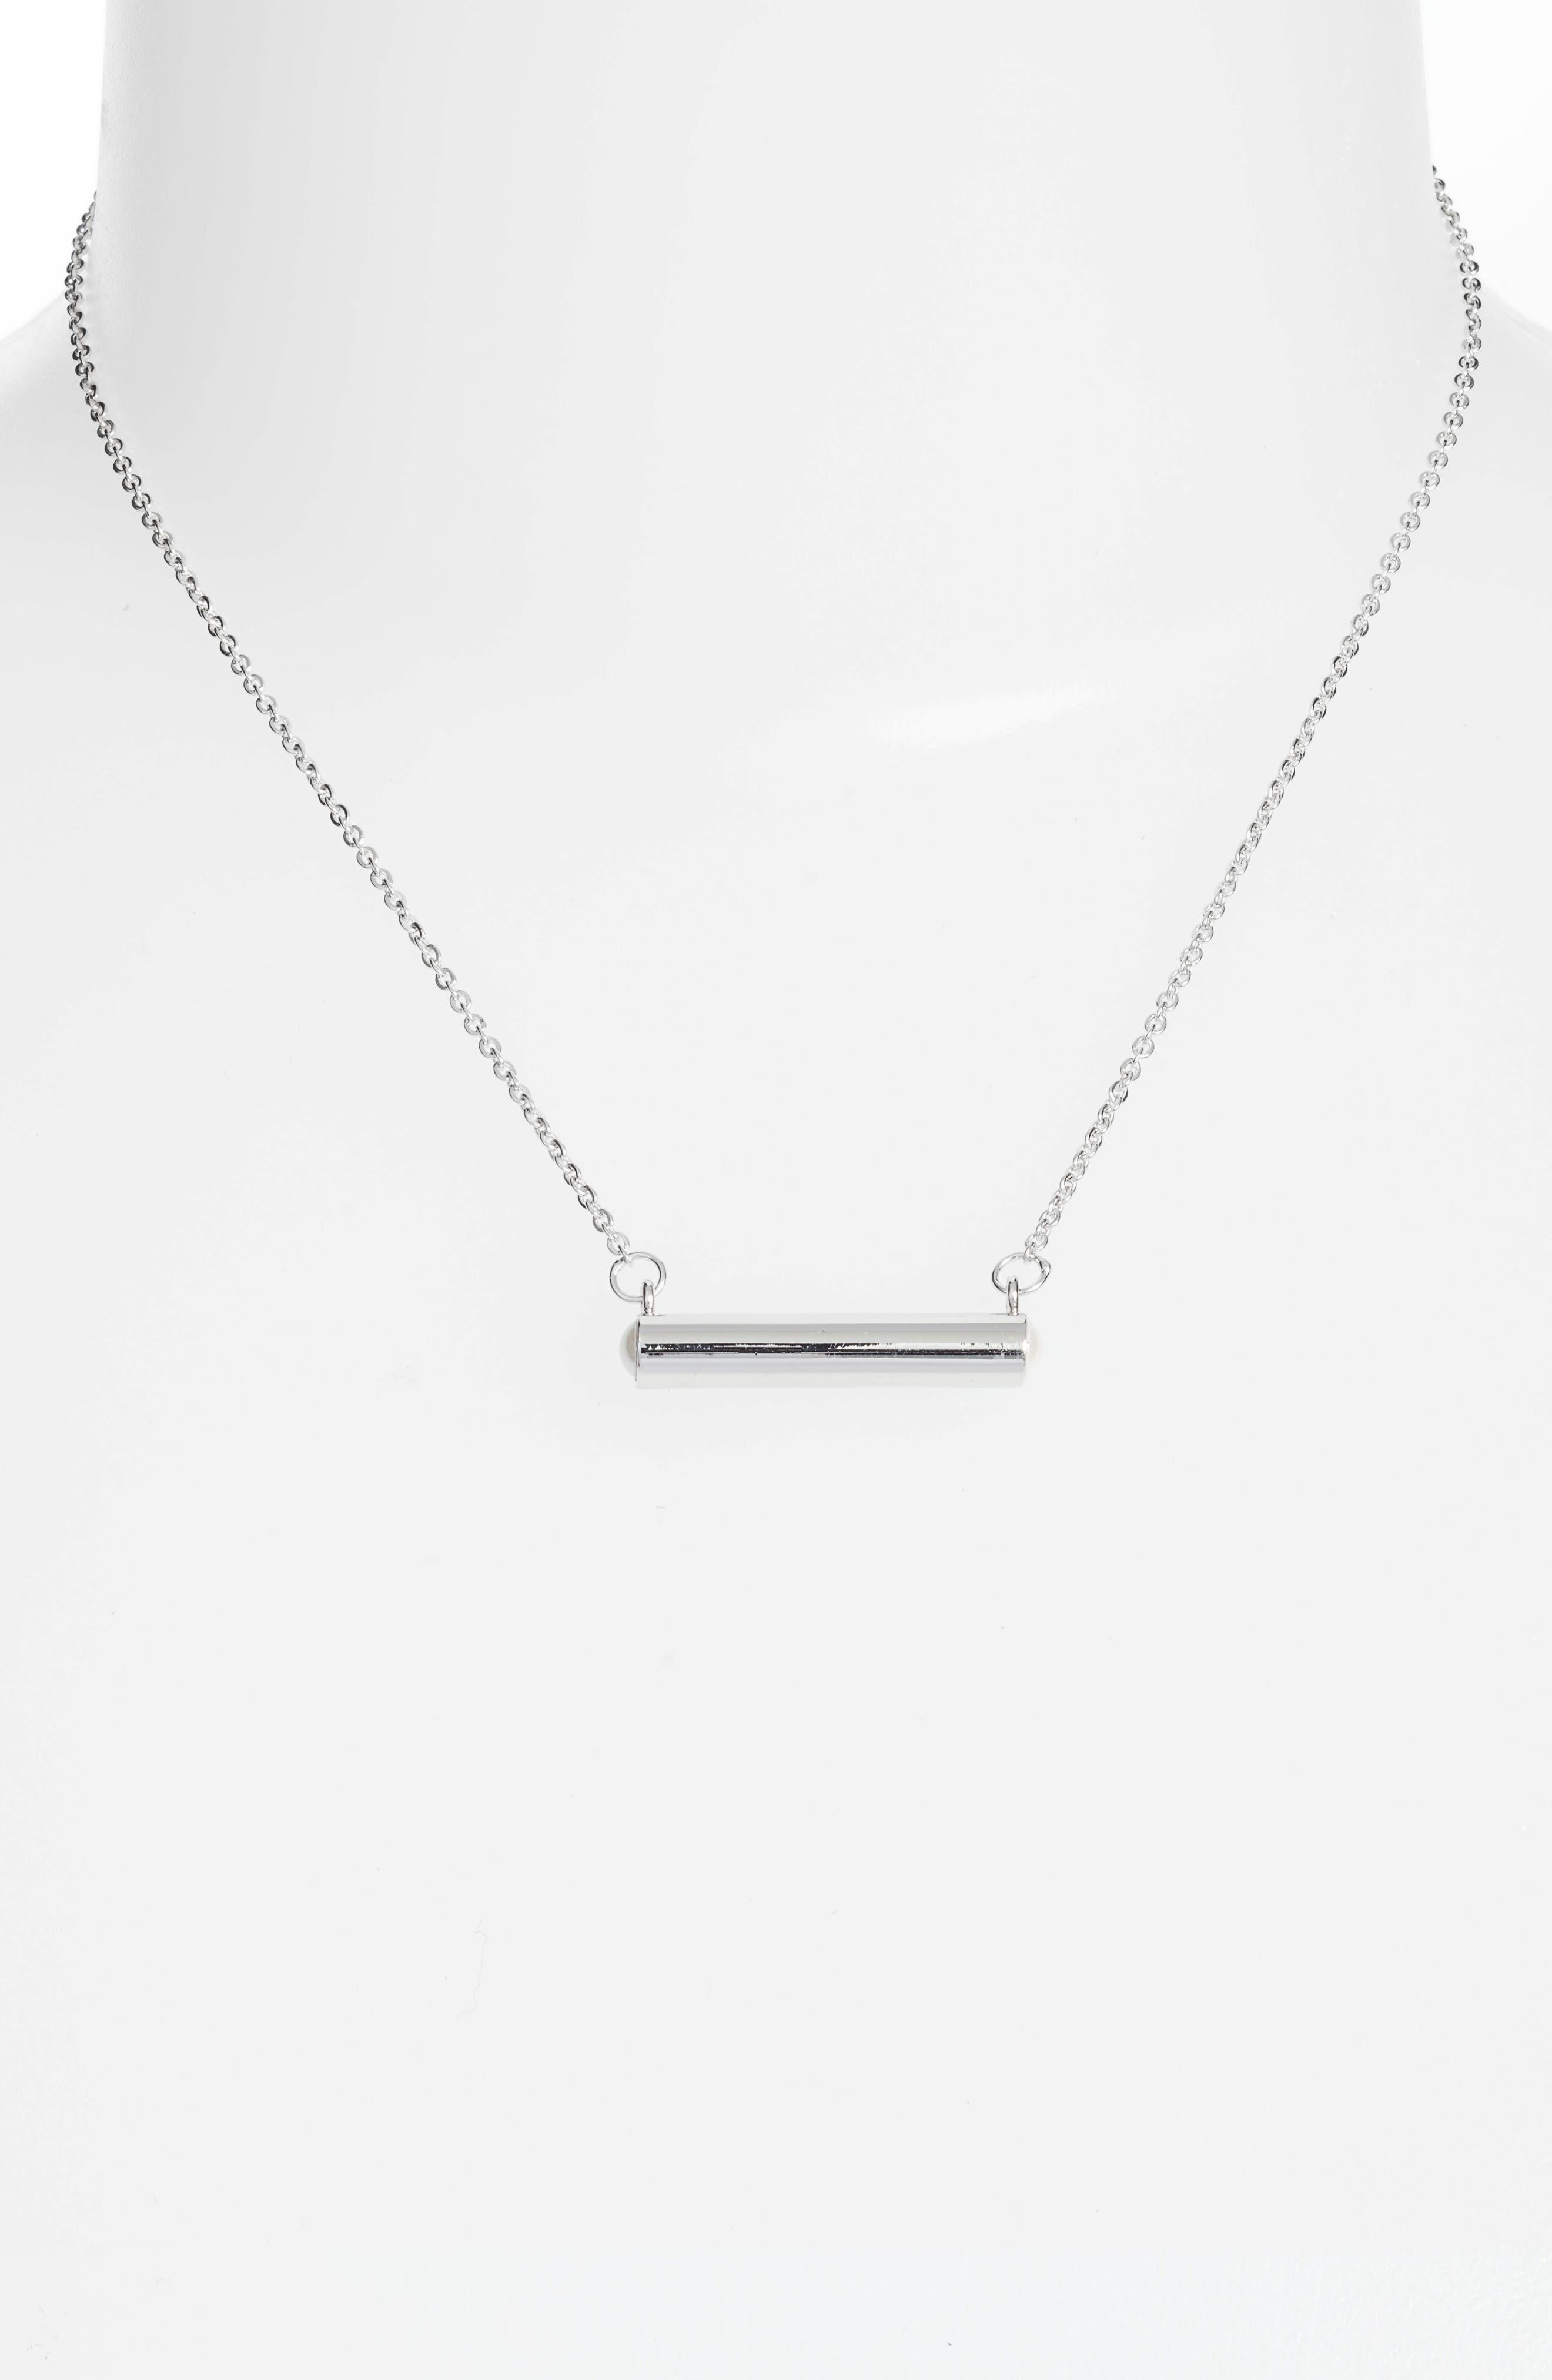 June Imitation Pearl Bar Pendant Necklace,                             Alternate thumbnail 2, color,                             040